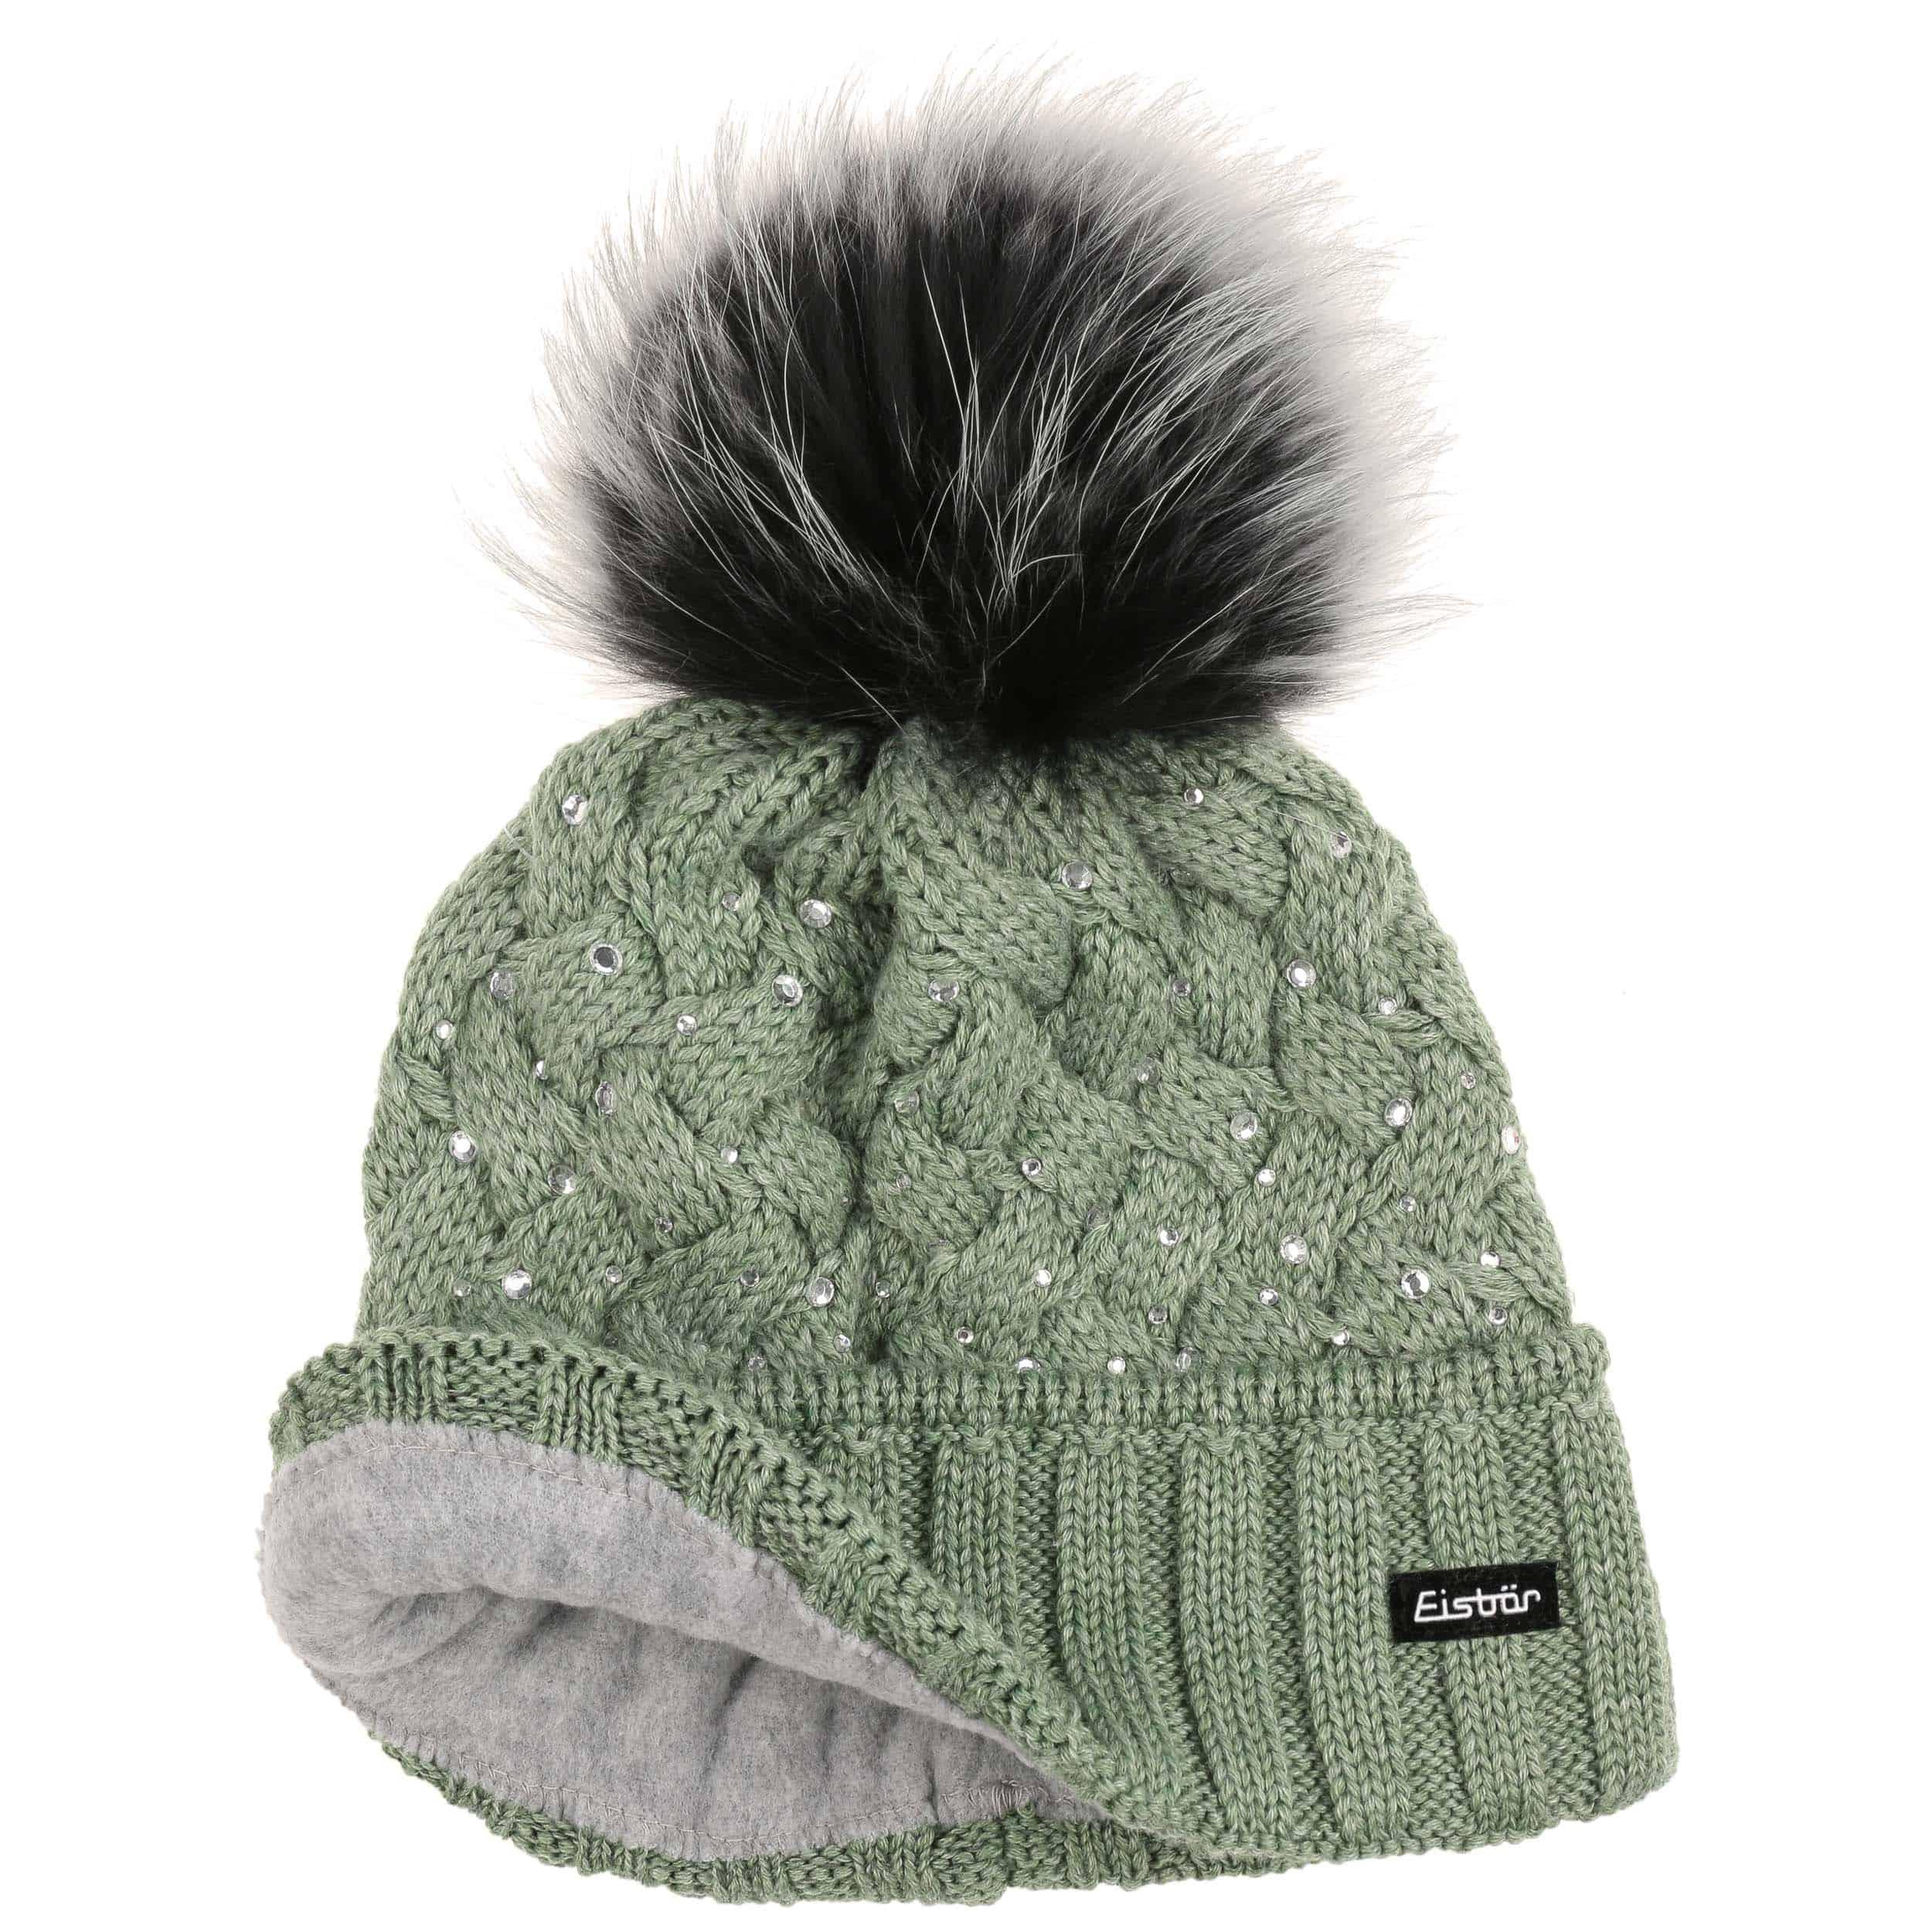 ... Alice Luxury Pompom Hat by Eisbär - green 1 ... afe028a9424